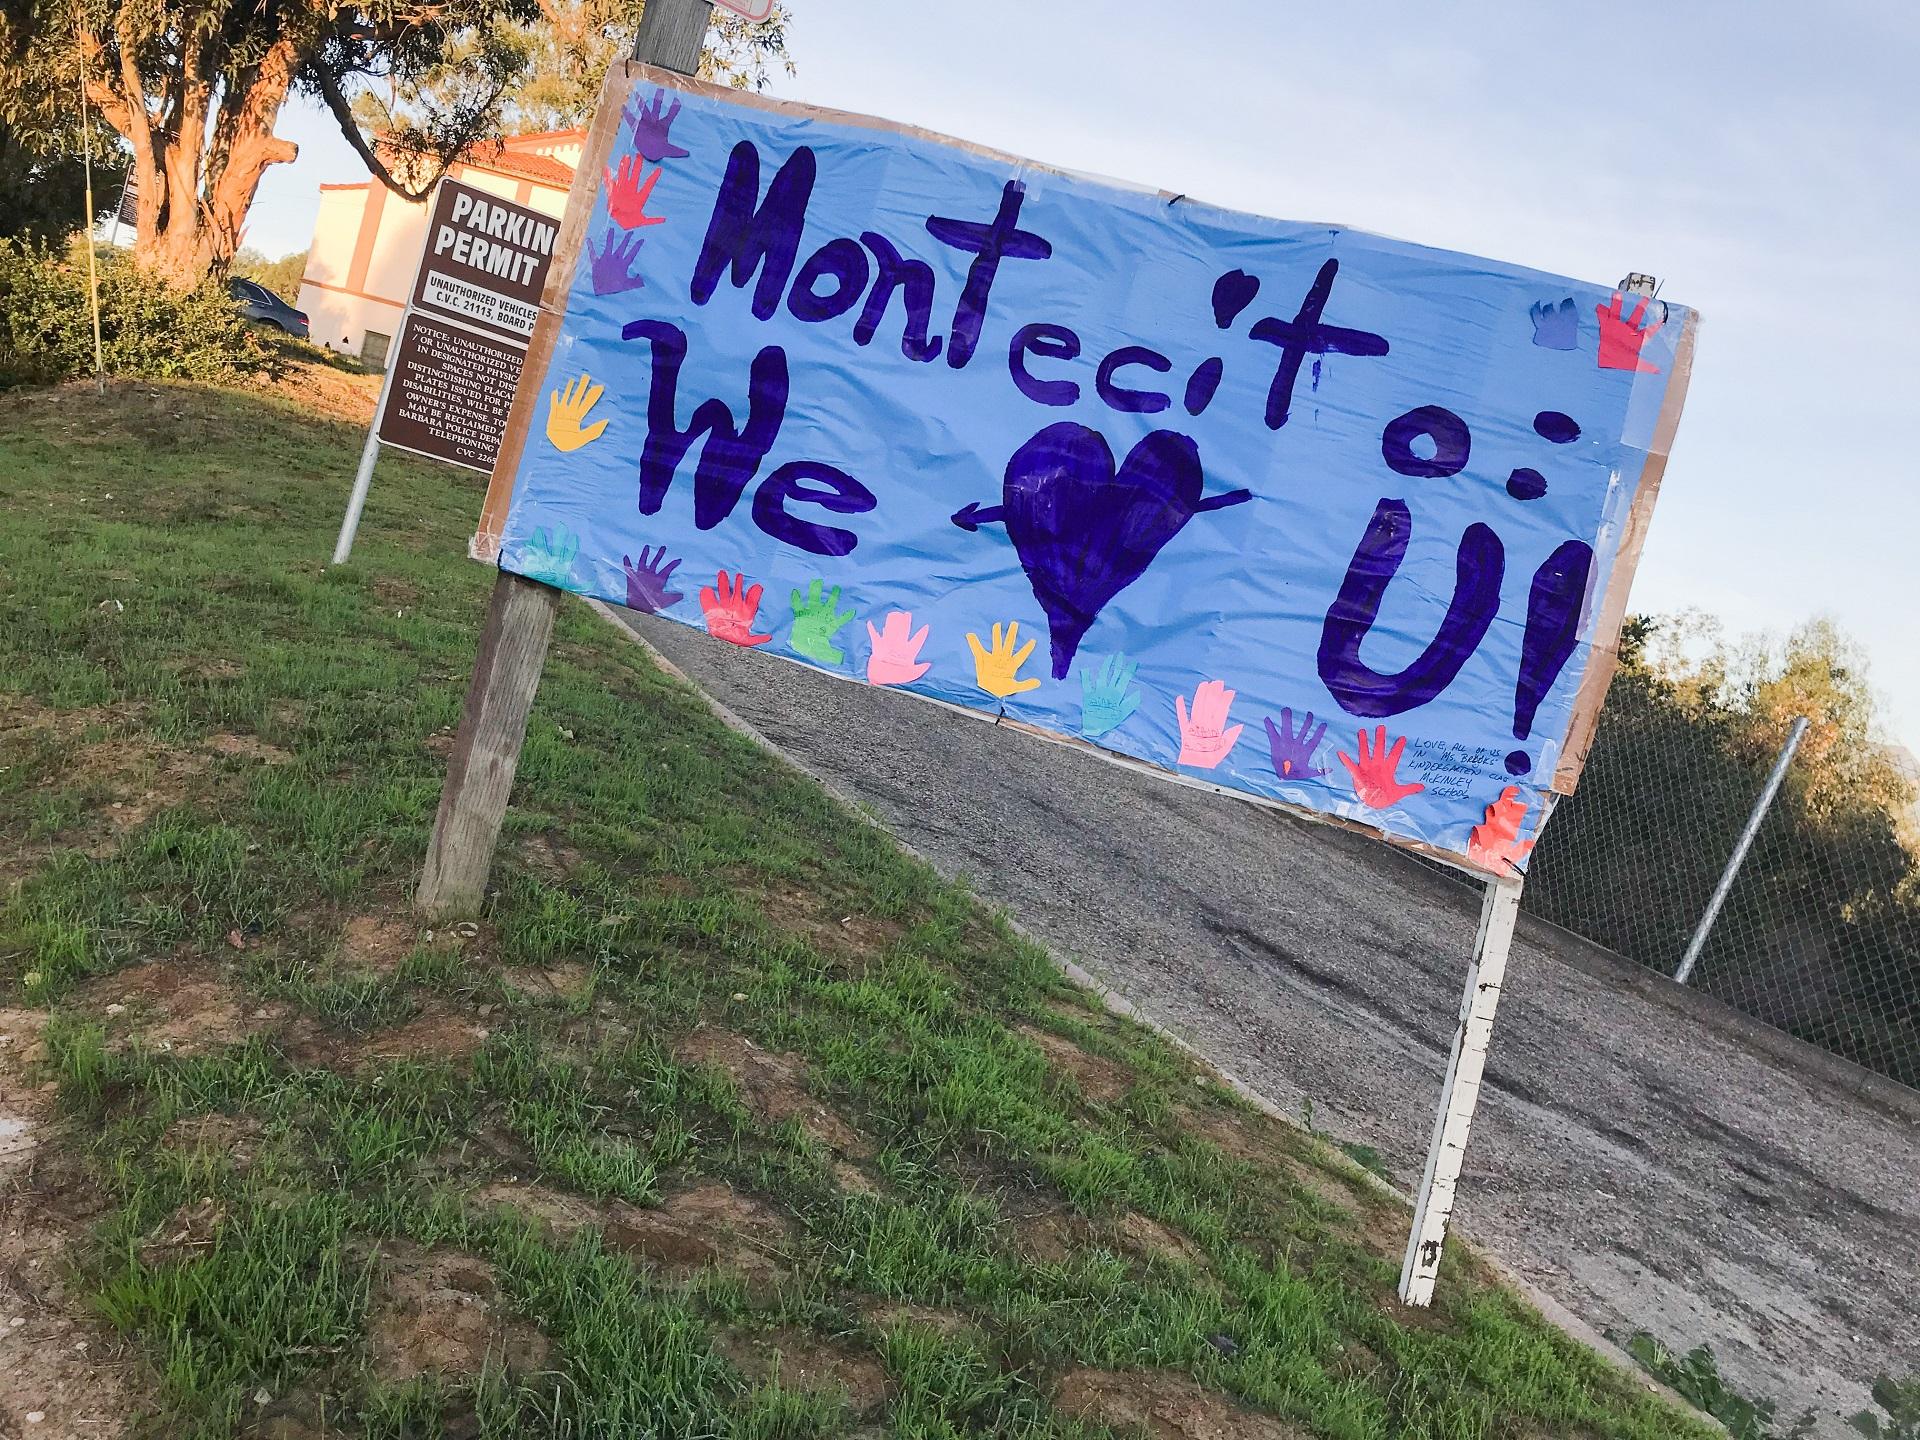 Montecito Union School Official Song